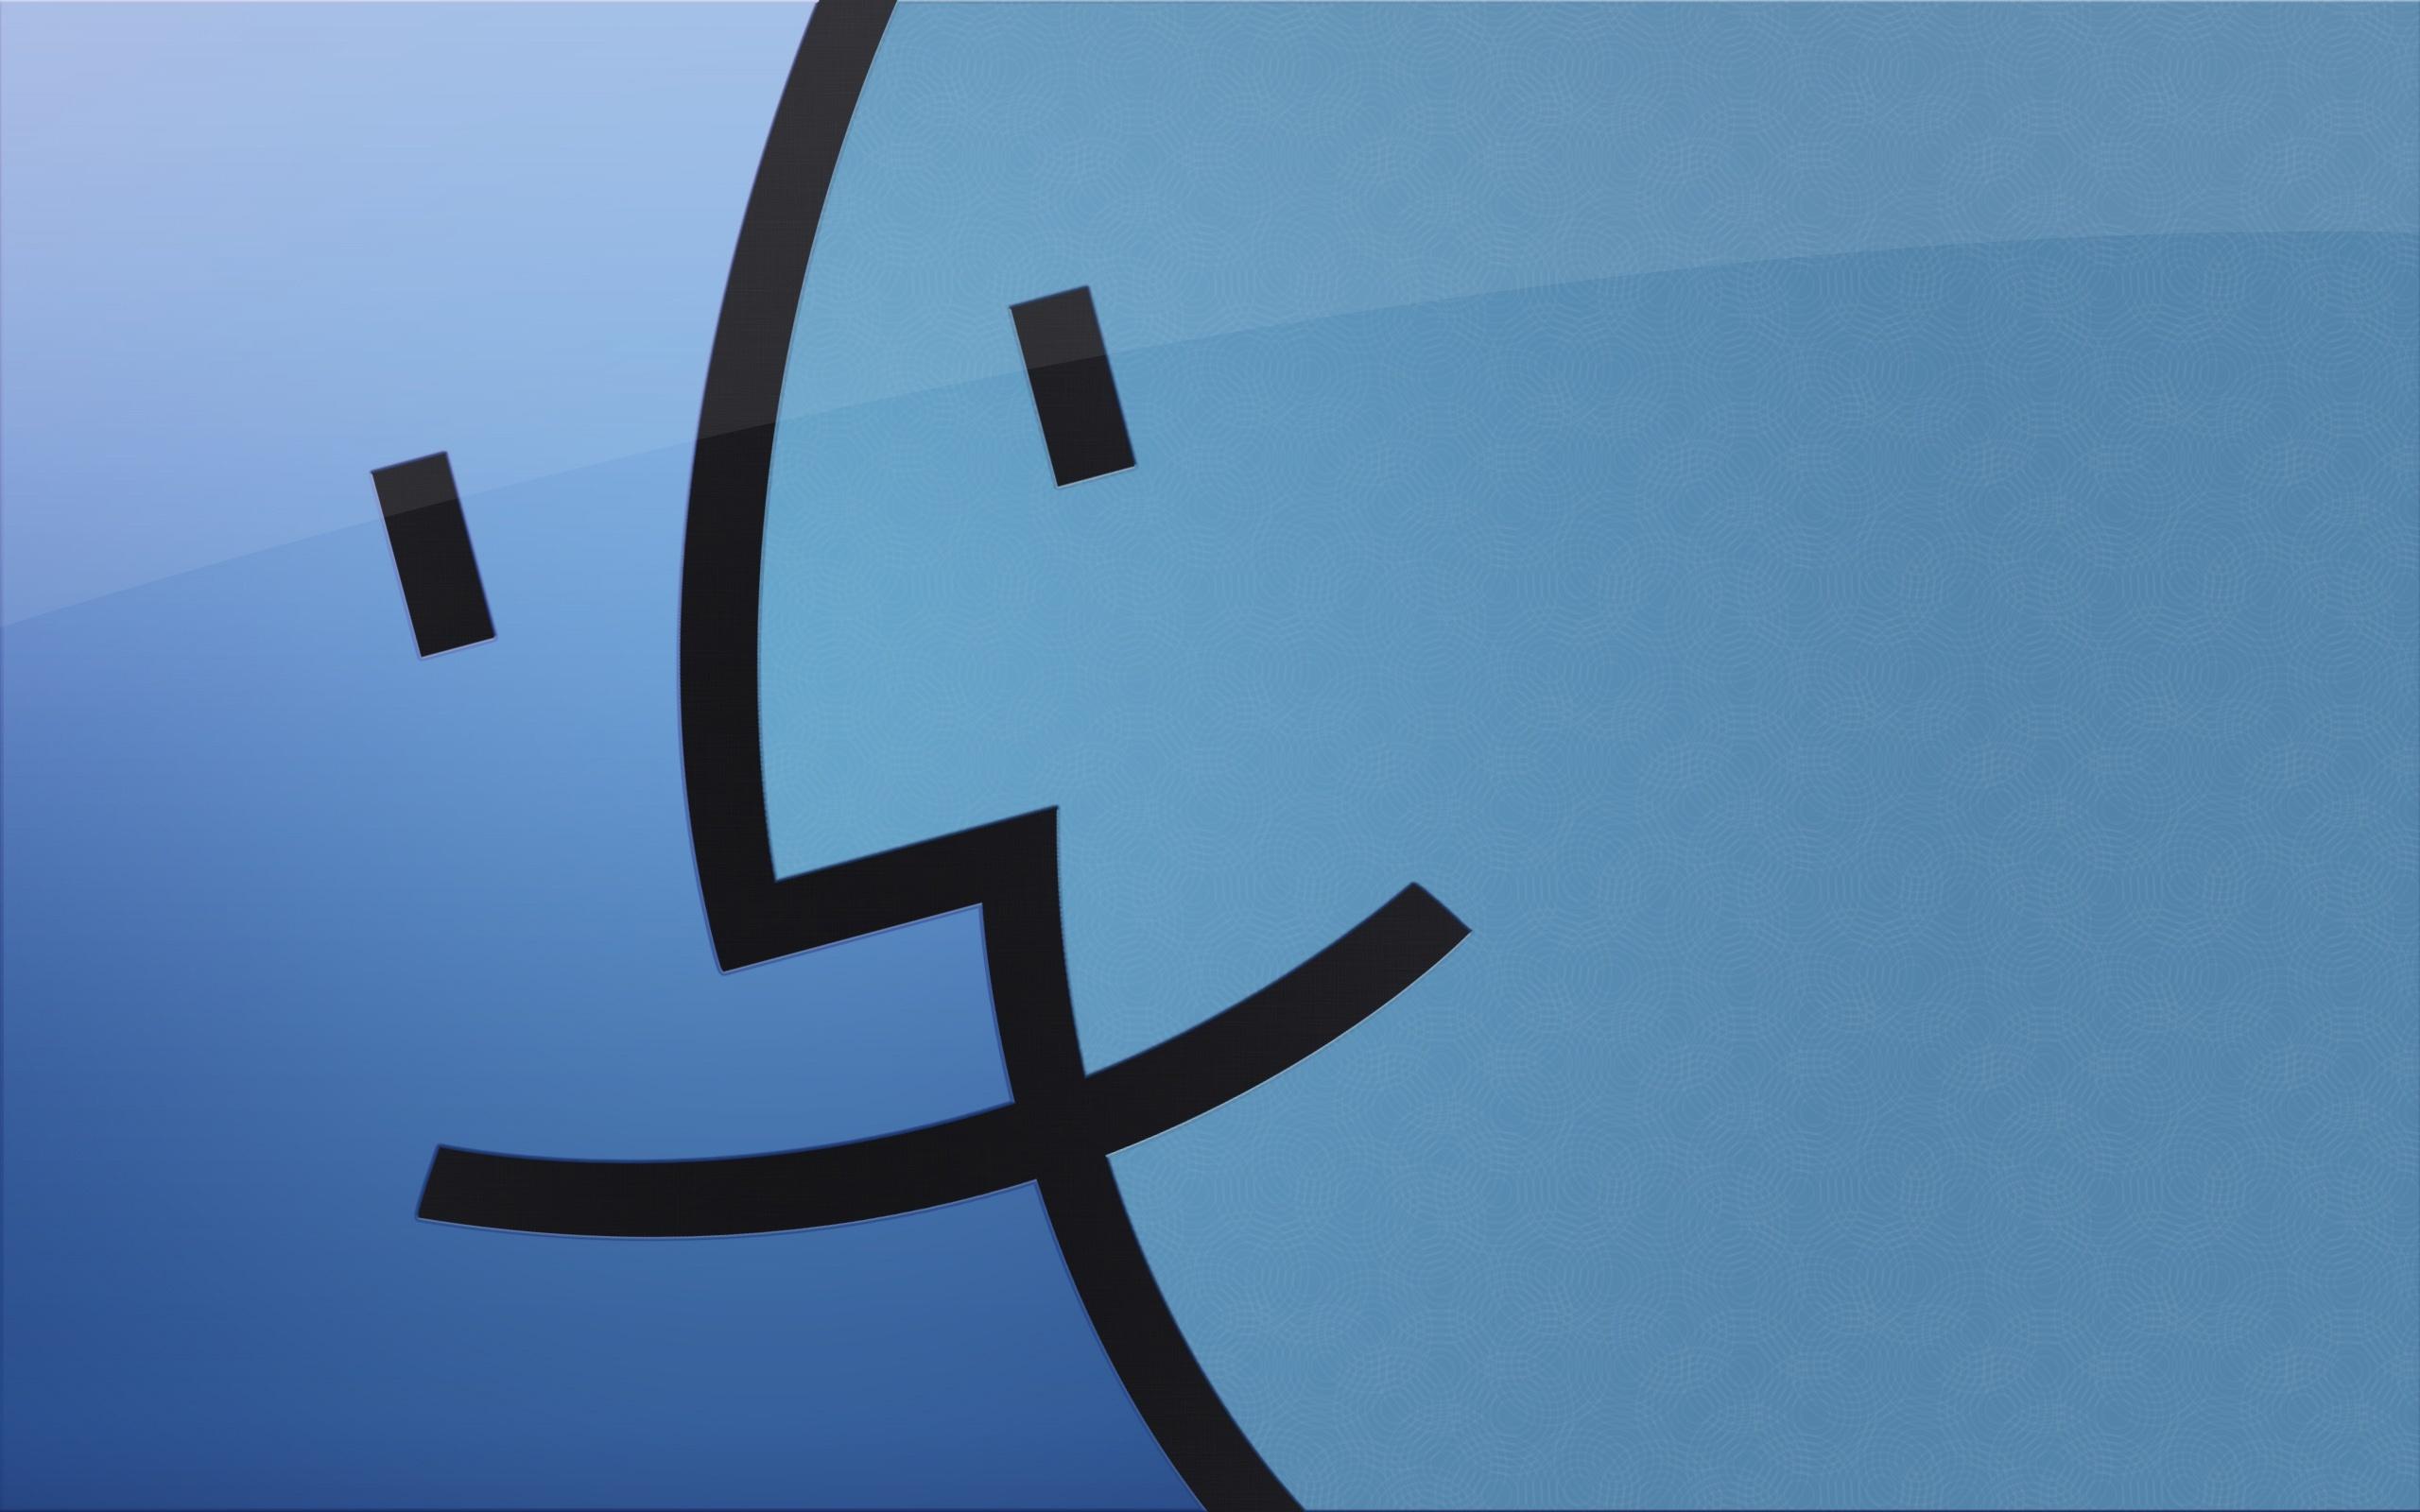 ¿Te funciona lento el Mac al abrir carpetas en OS X 10.10.3?